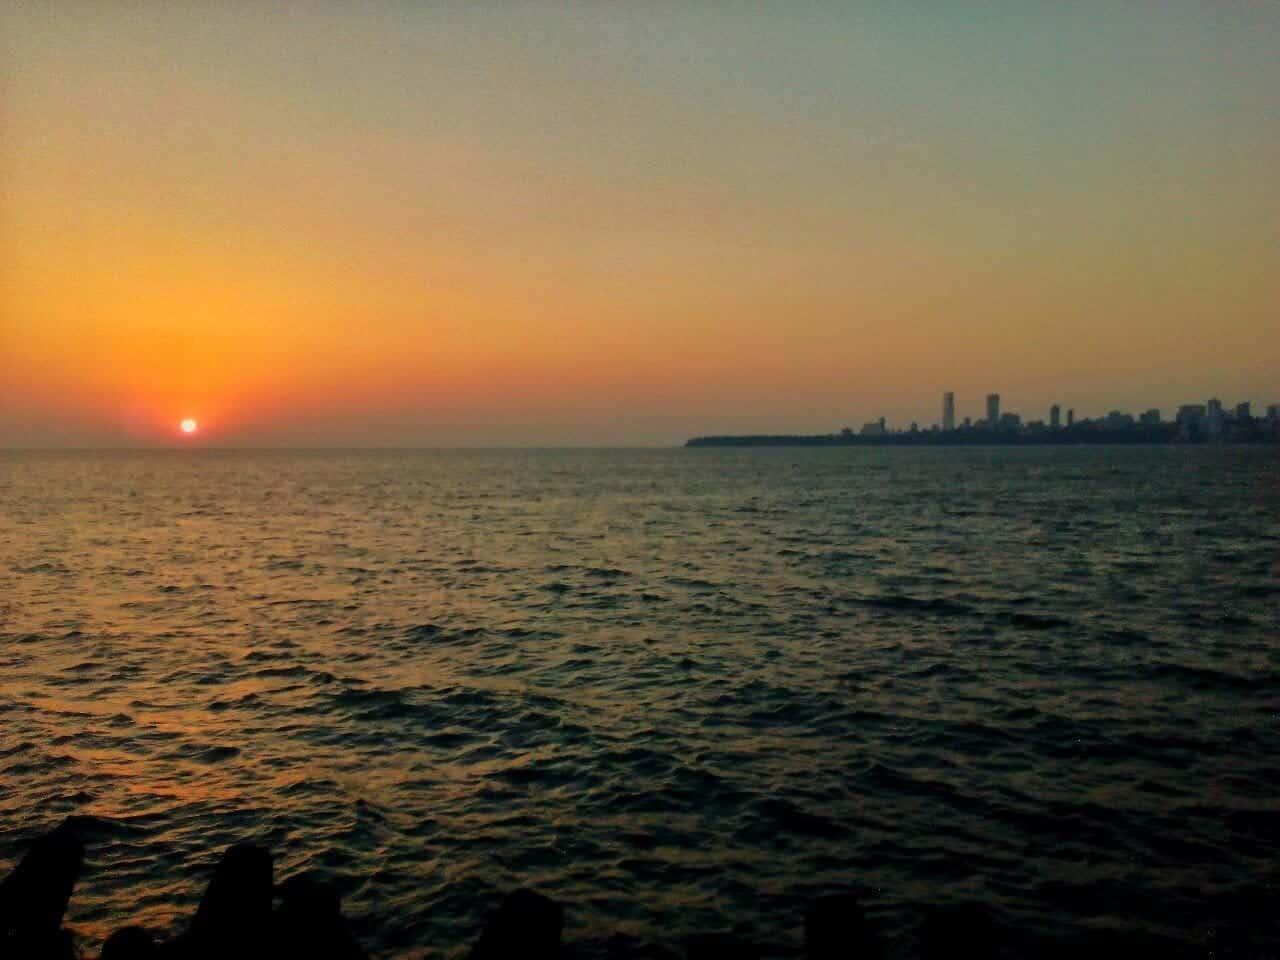 Sunset from Marine Drive - Mumbai, Maharashtra